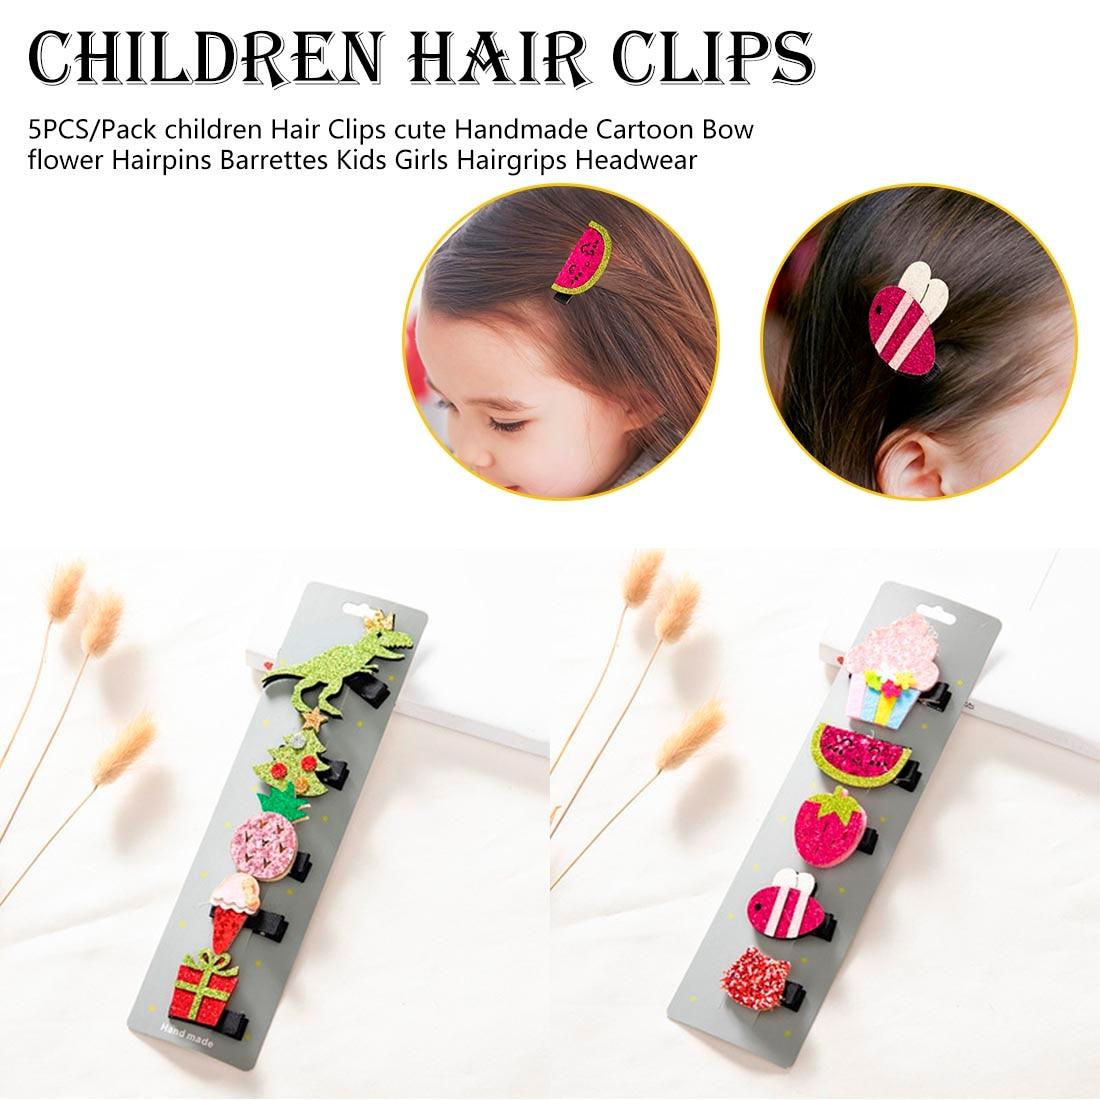 5PCS/Pack children Hair Clips cute Handmade Cartoon Bow flower Hairpins Barrettes Kids Girls Hairgrips Head wear